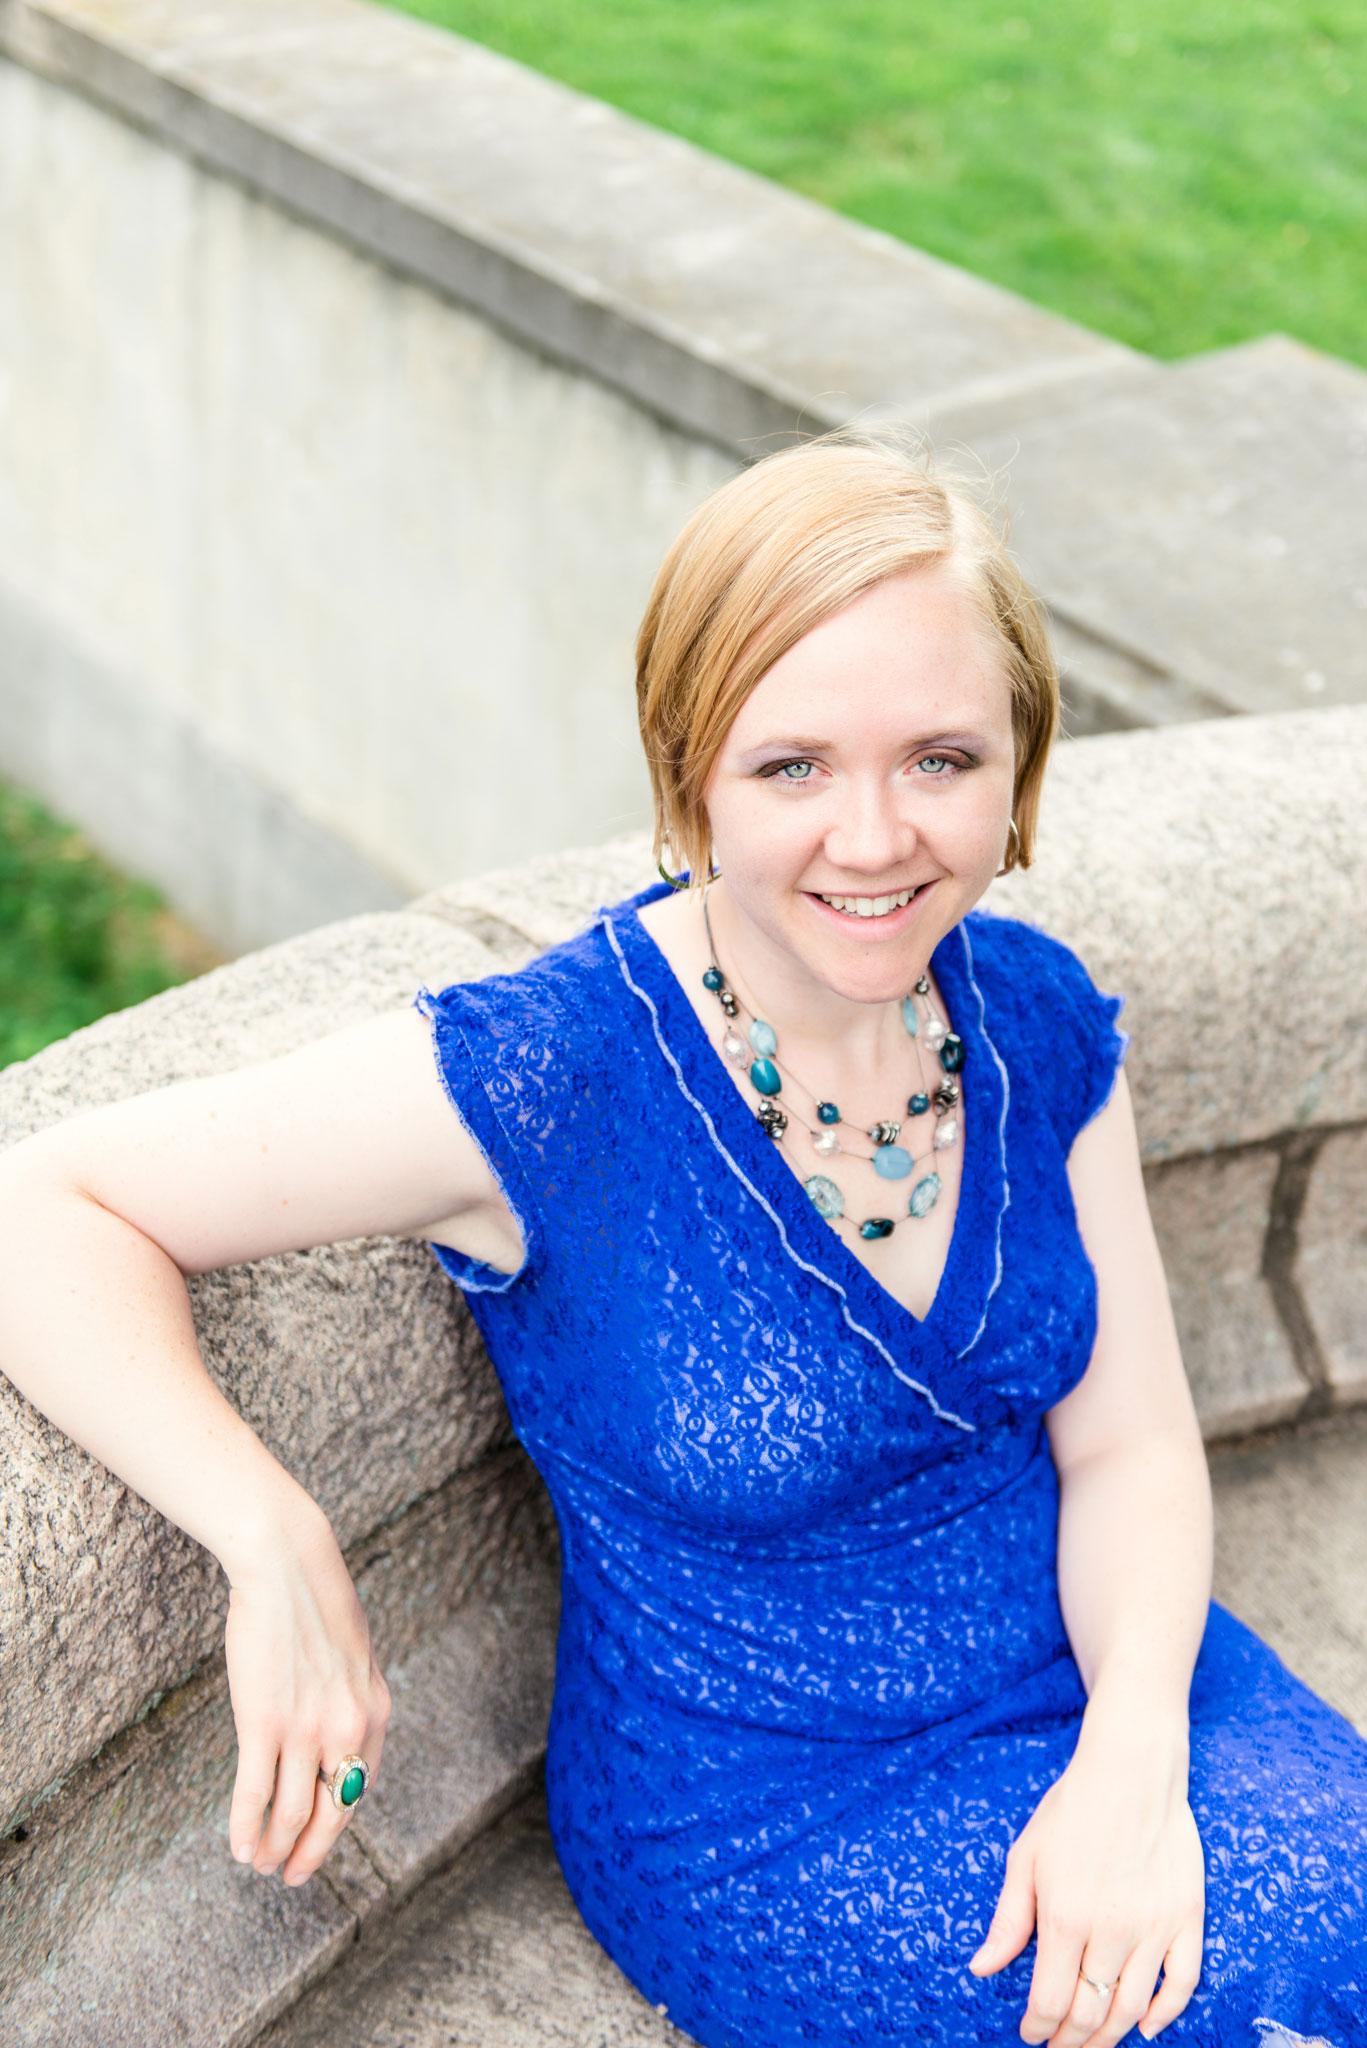 Boston Summer Lifestyle + Professional Portrait Photography | Mary Casiello | Lorna Stell | Photographer | Boston MA